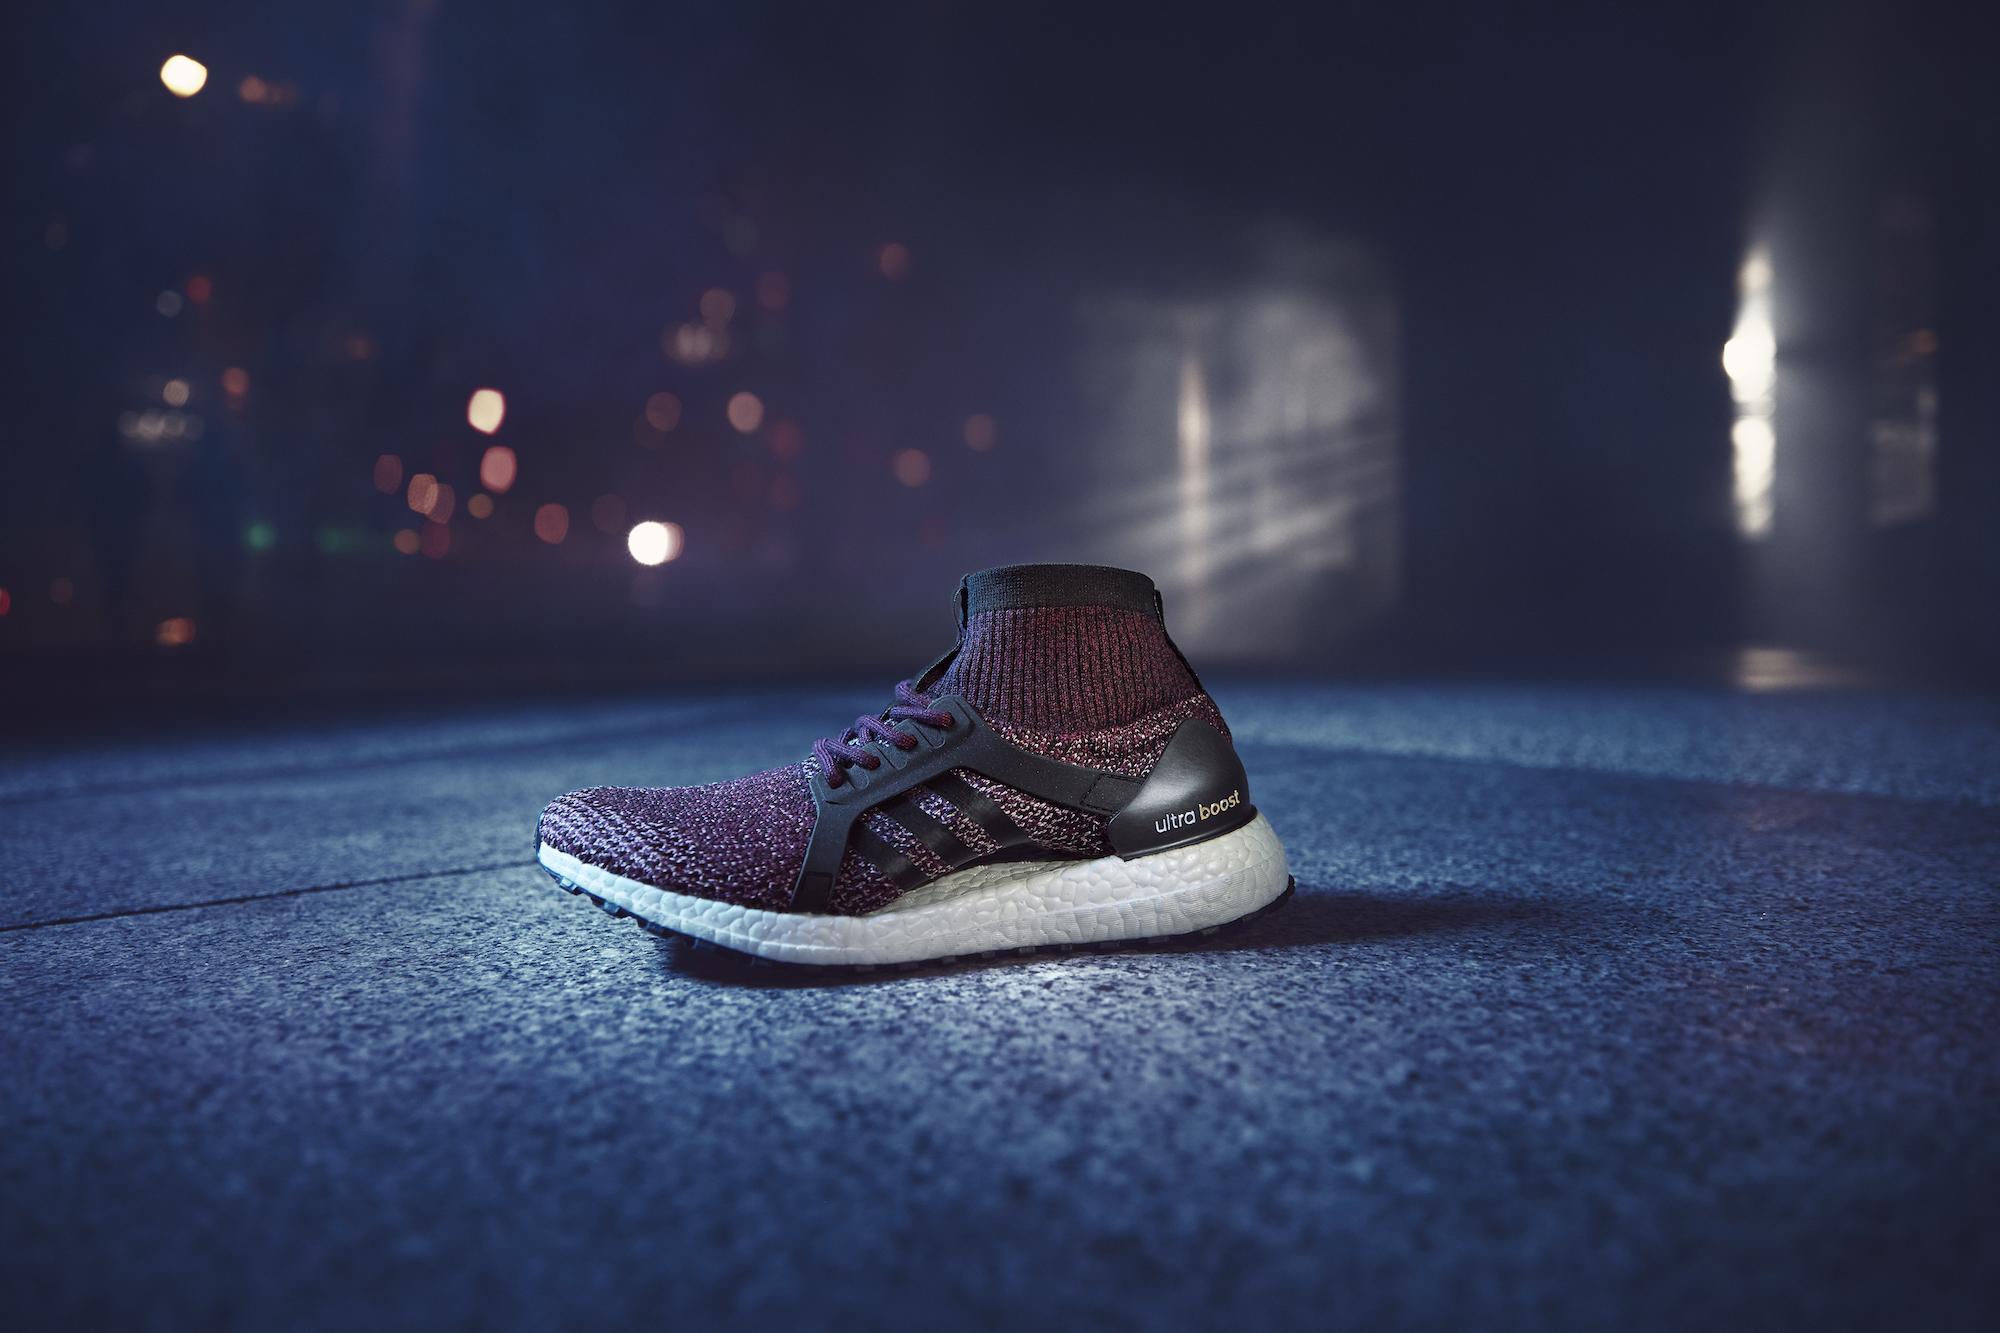 adidas ultraboost x% 74 weartesters